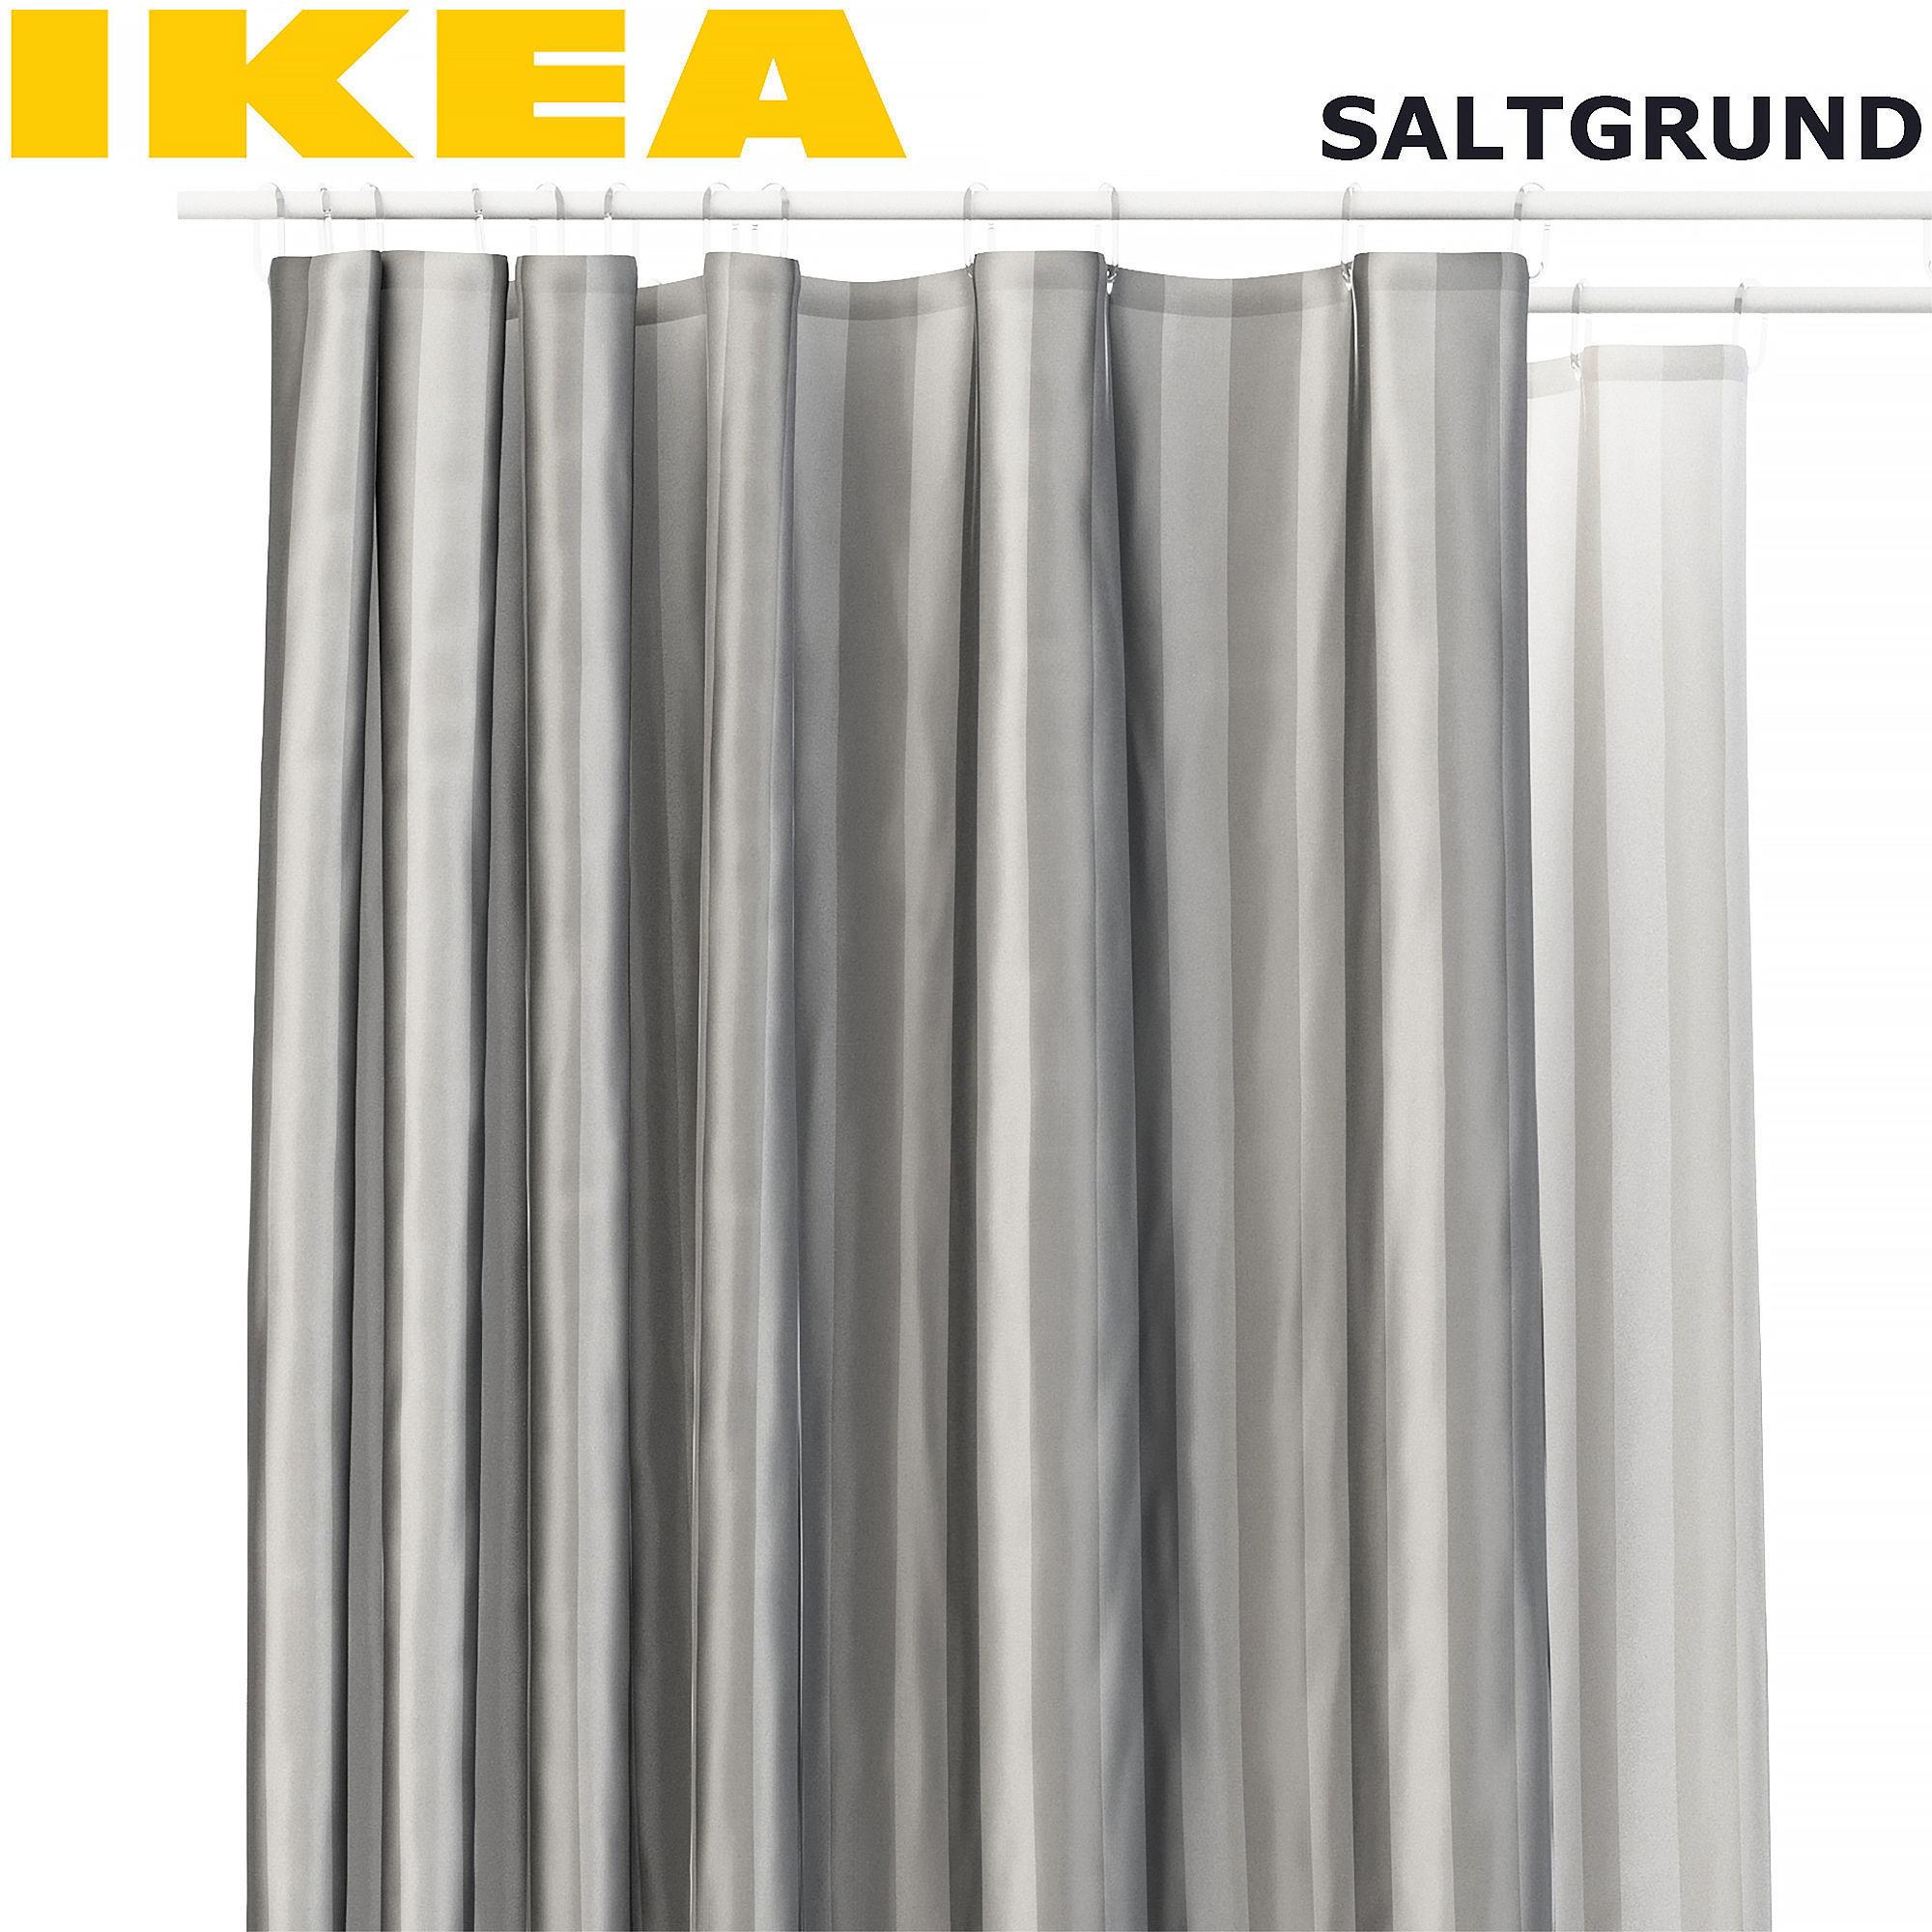 Fullsize Of Ikea Shower Curtains